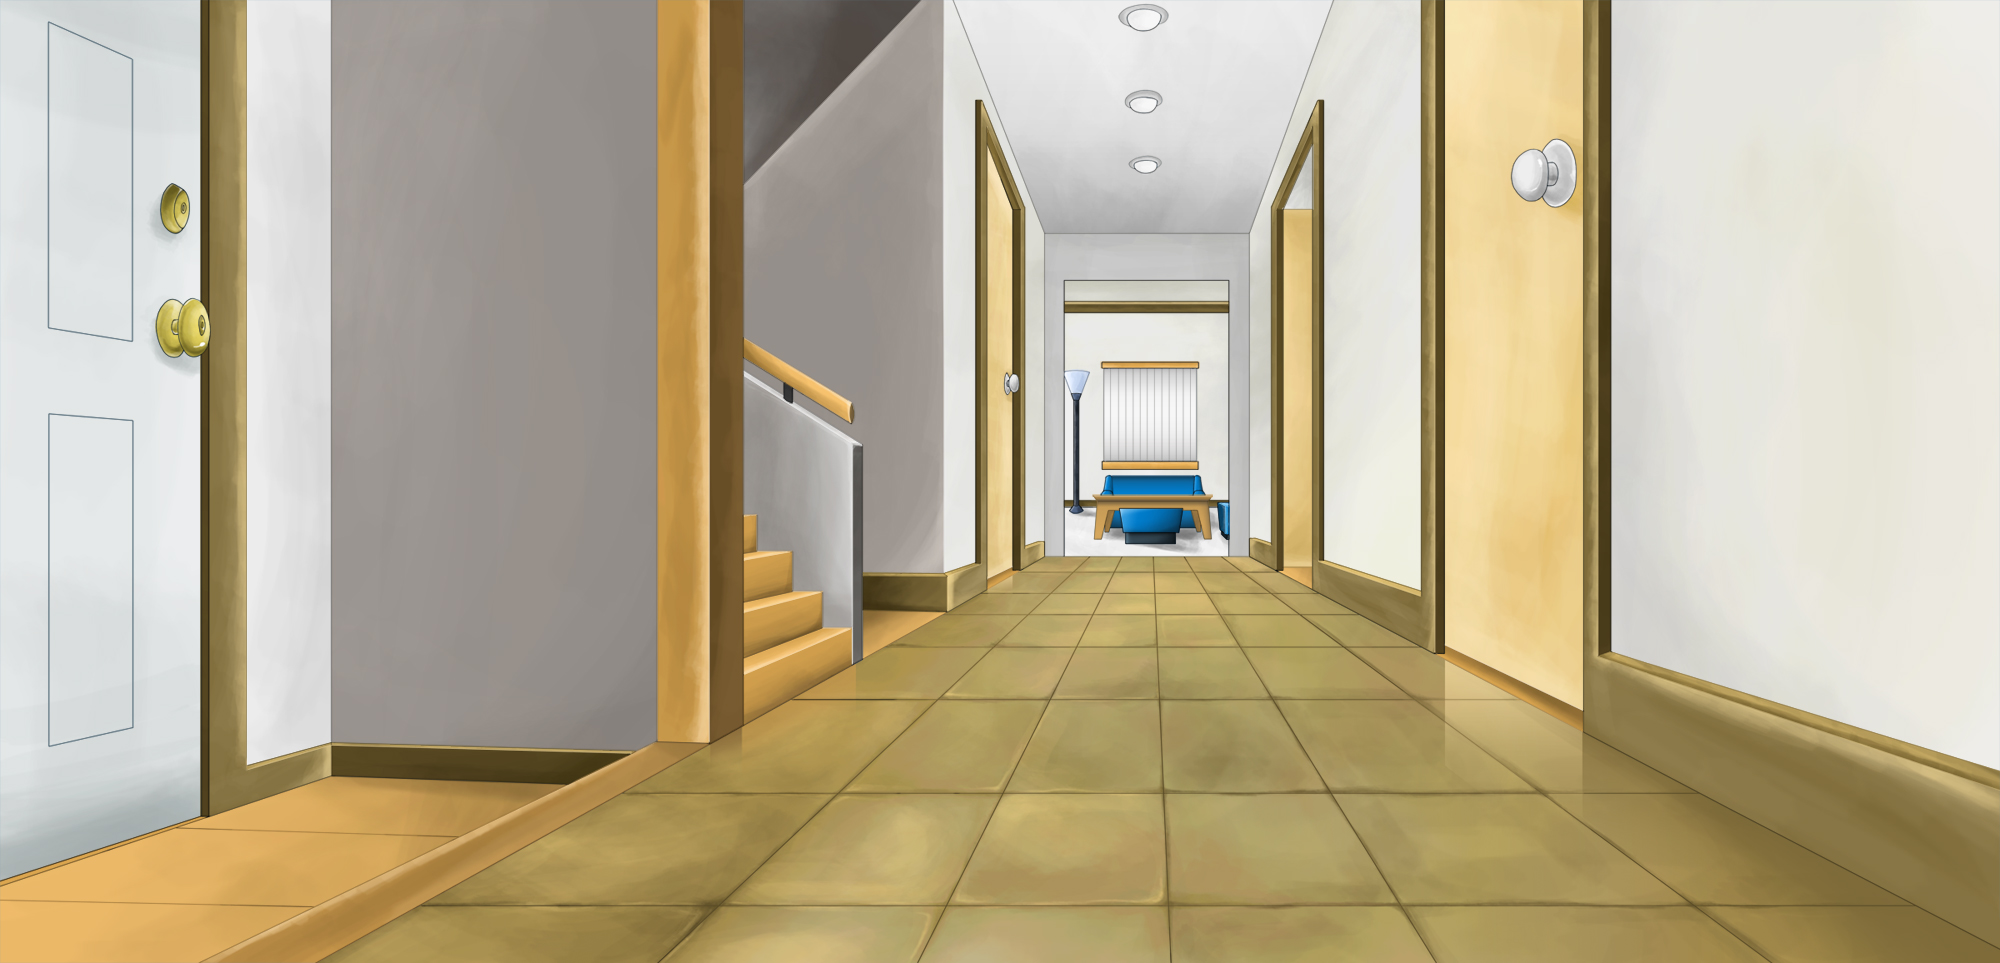 antina kuca Hallway1